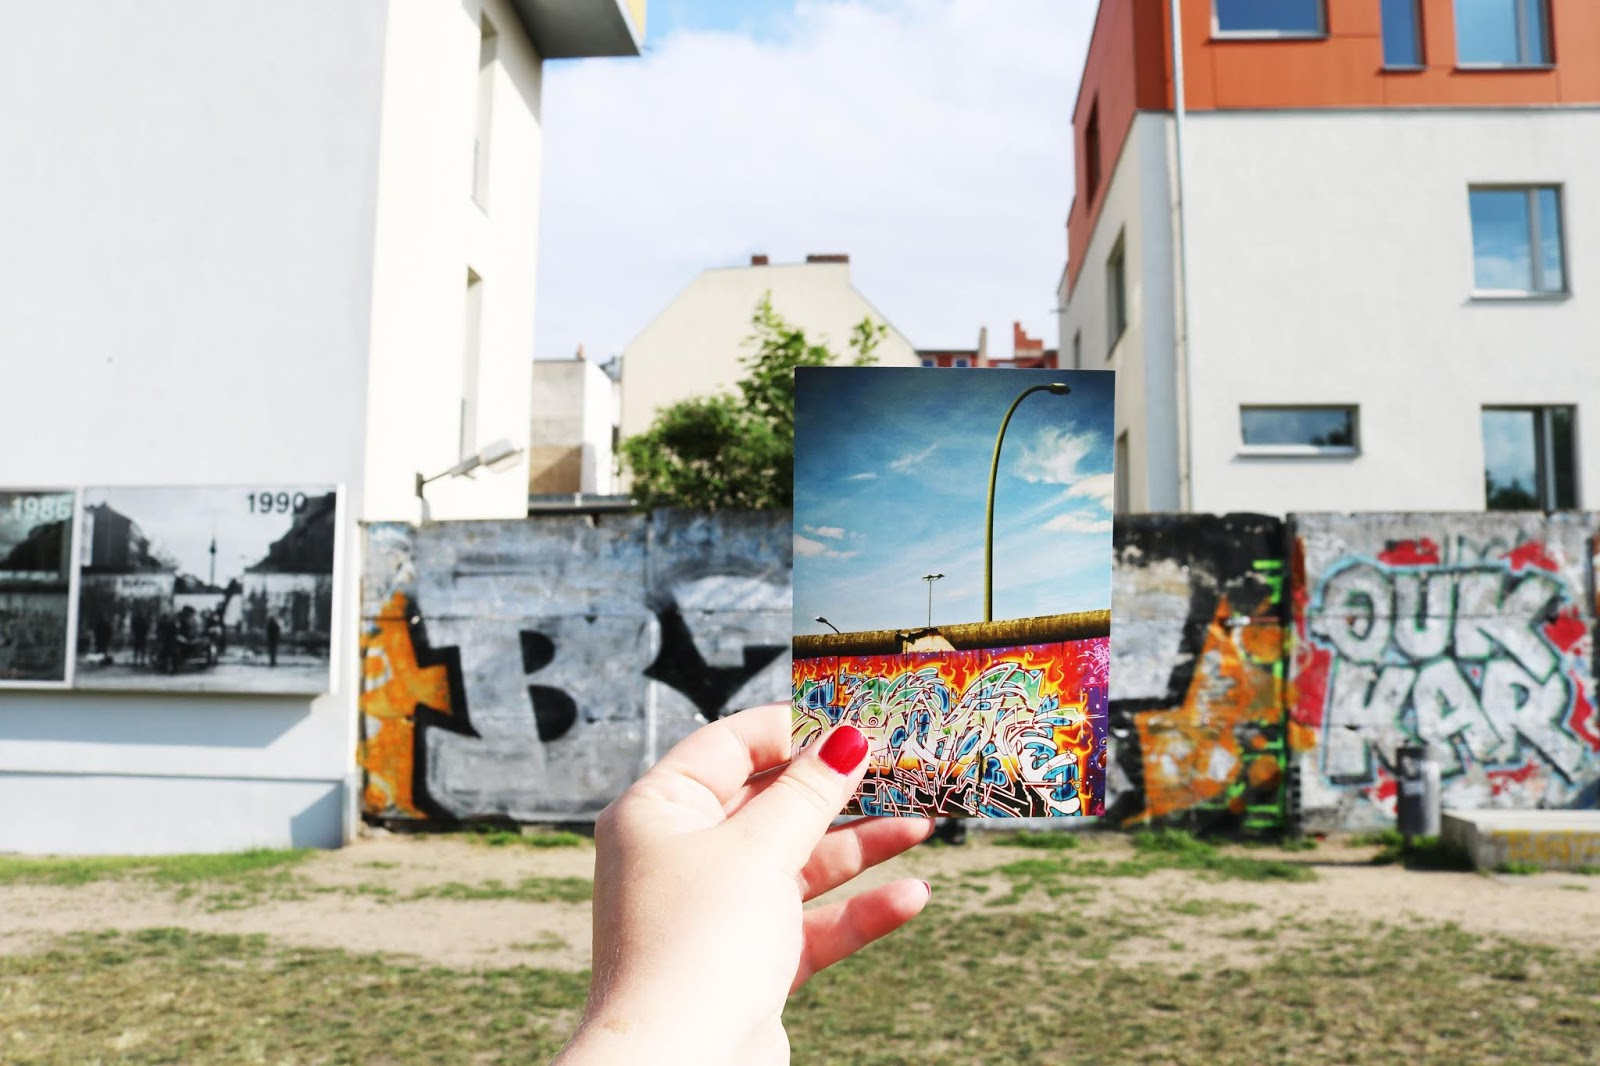 Travel | Stedentrip Berlijn, dag 1!